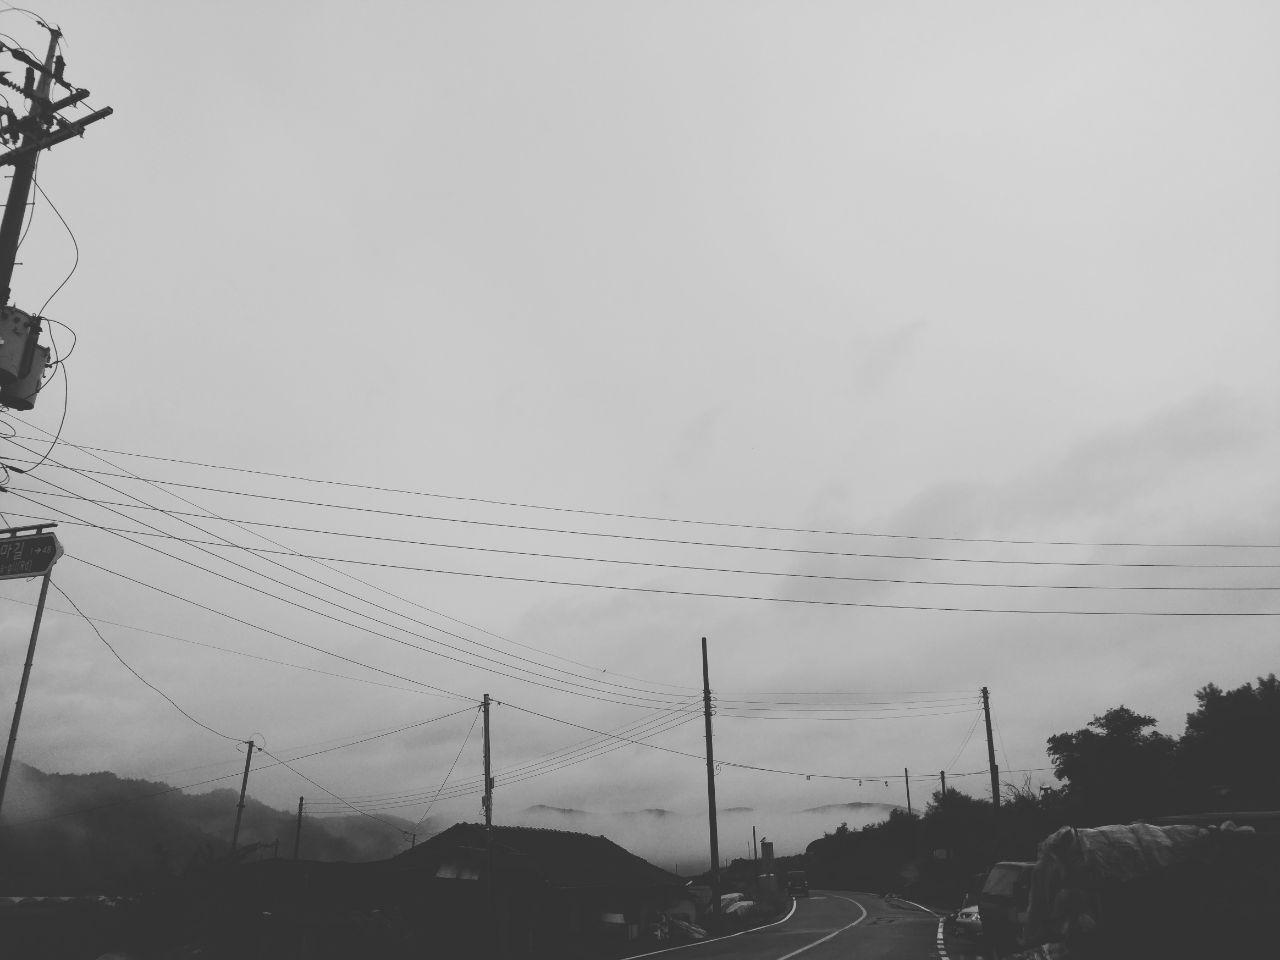 photo_2018-10-26_06-39-39 (2).jpg